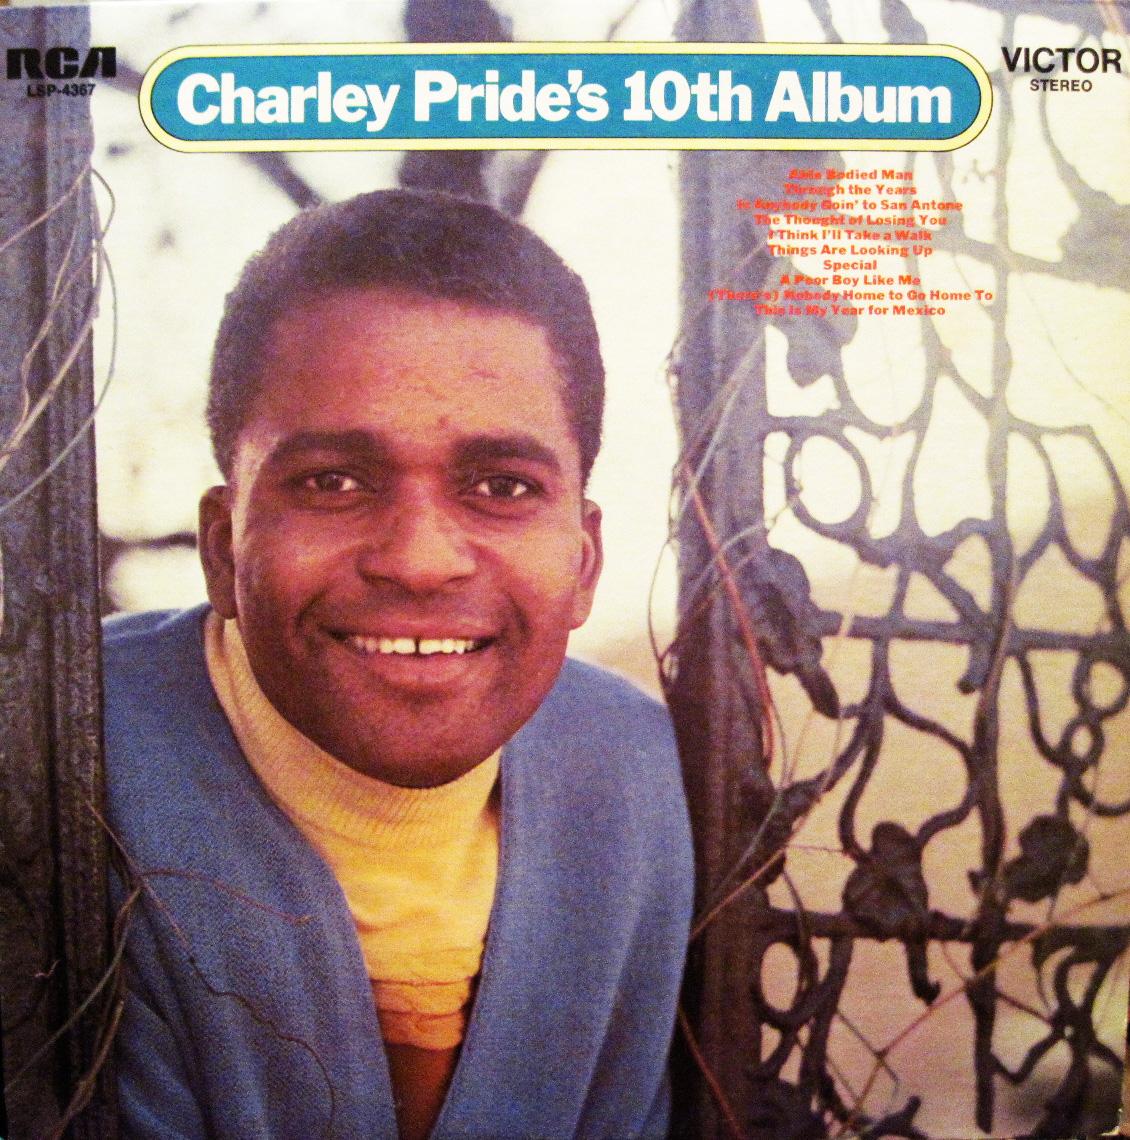 El Rancho Charley Pride 39 S 10th Album Charley Pride 1970